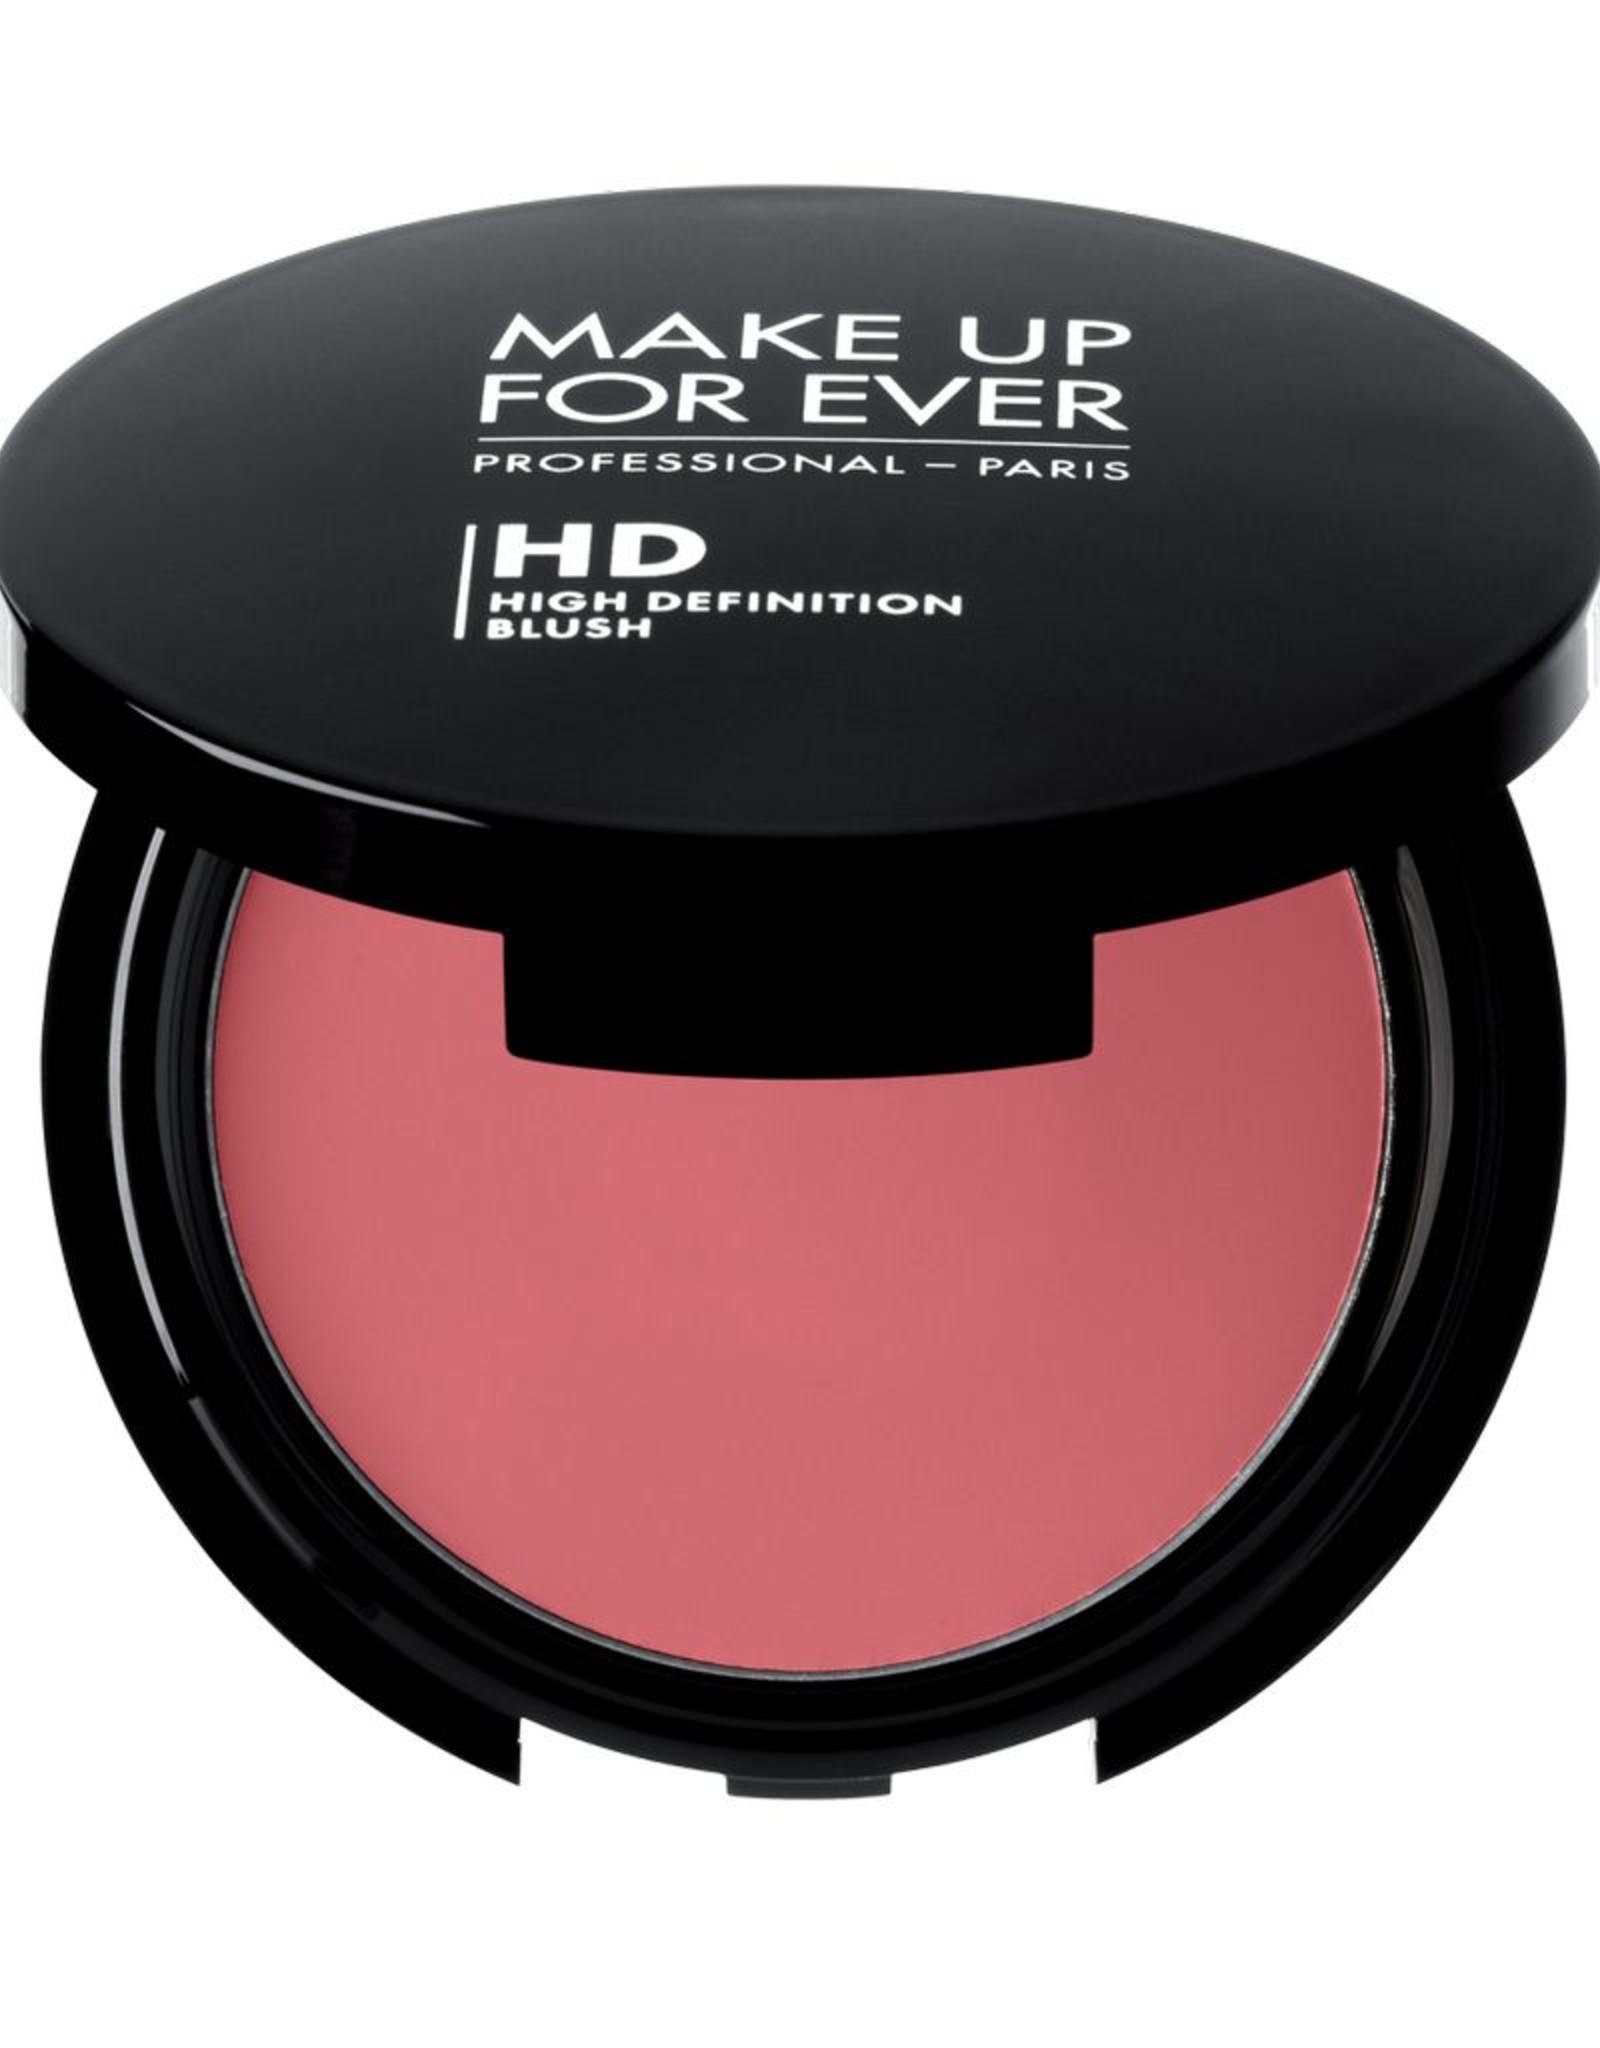 MUFE HD BLUSH CREME 2.8G#330: Rosy Plum